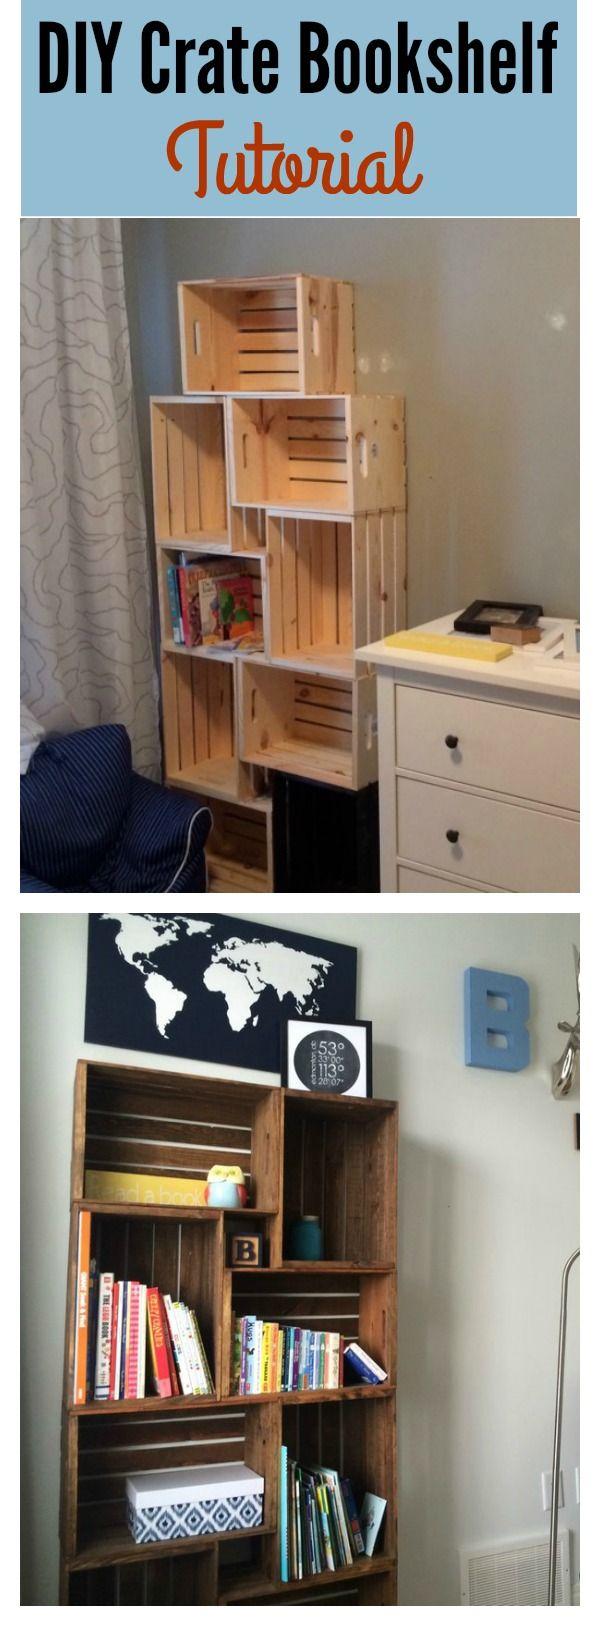 Id id ideas de cocina de los pa ses de bricolaje - Diy Crate Bookshelf